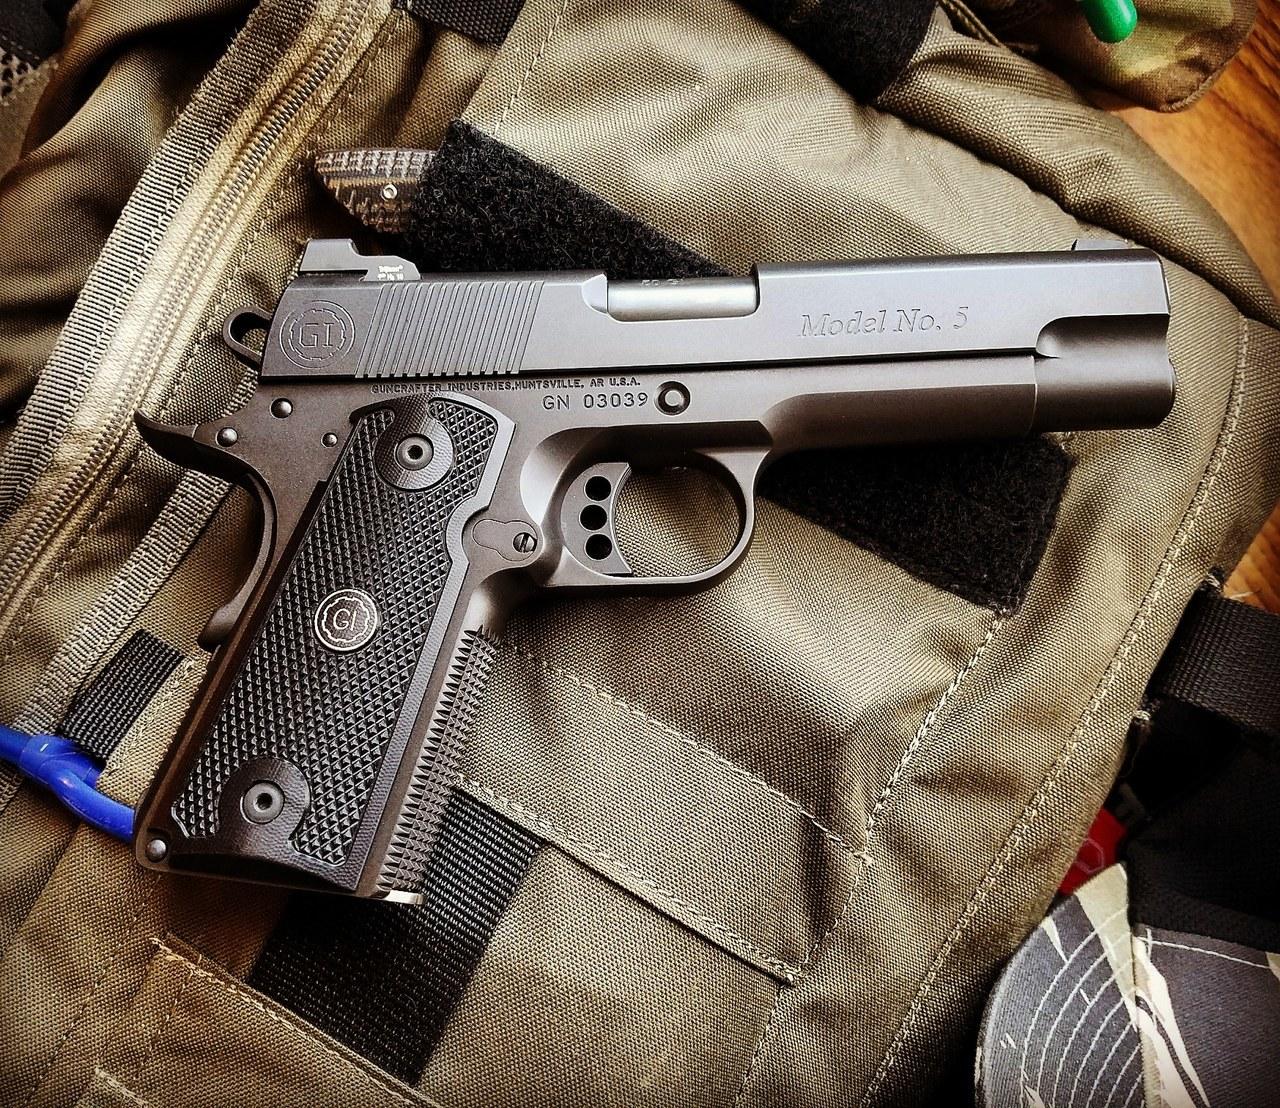 Guncrafter Industries Model 5 Custom concealed carry pistol